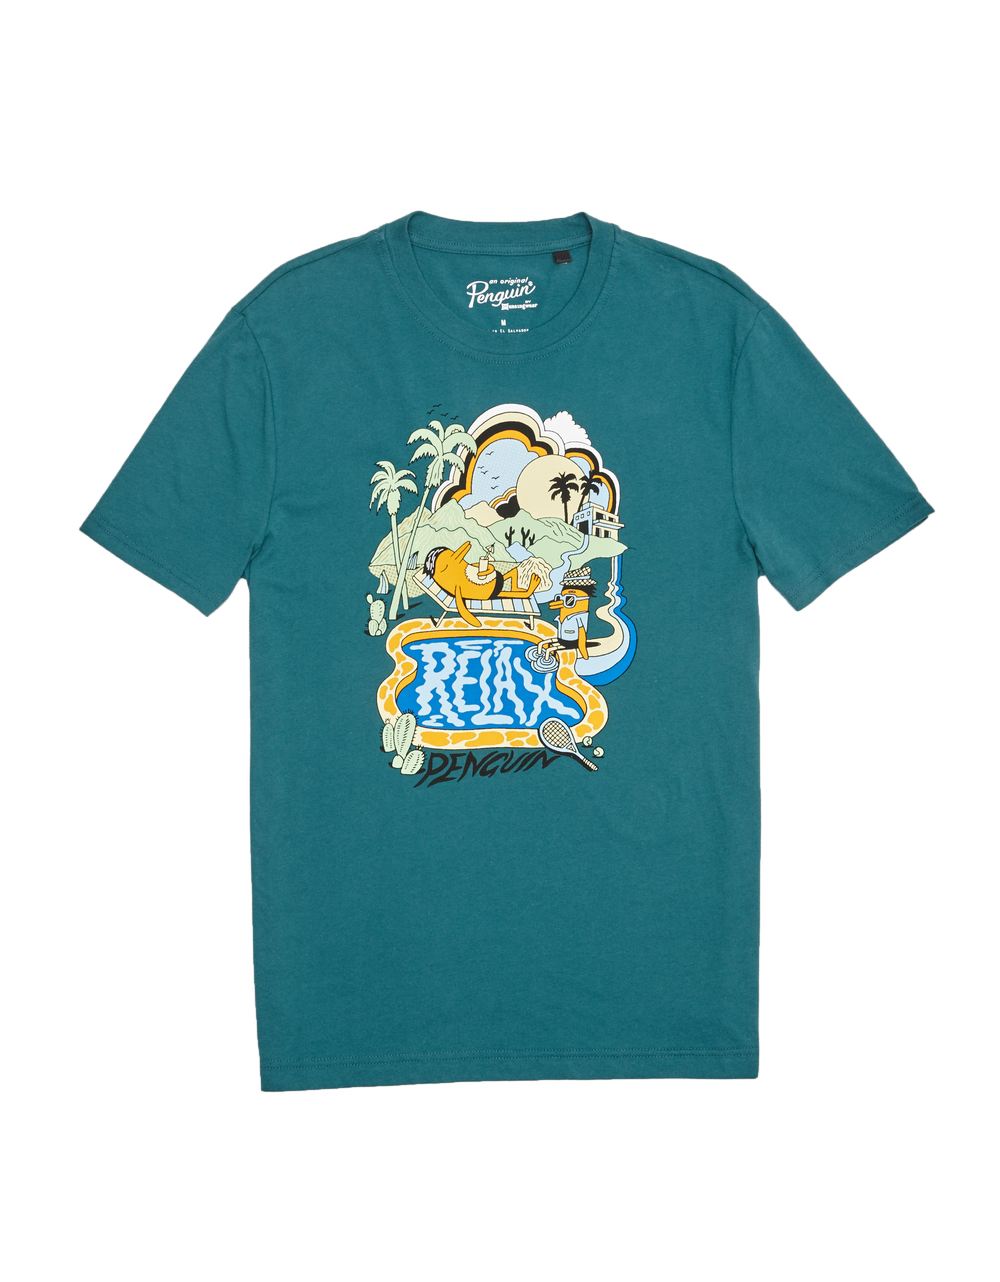 Jeremyville Tshirt 1.jpg